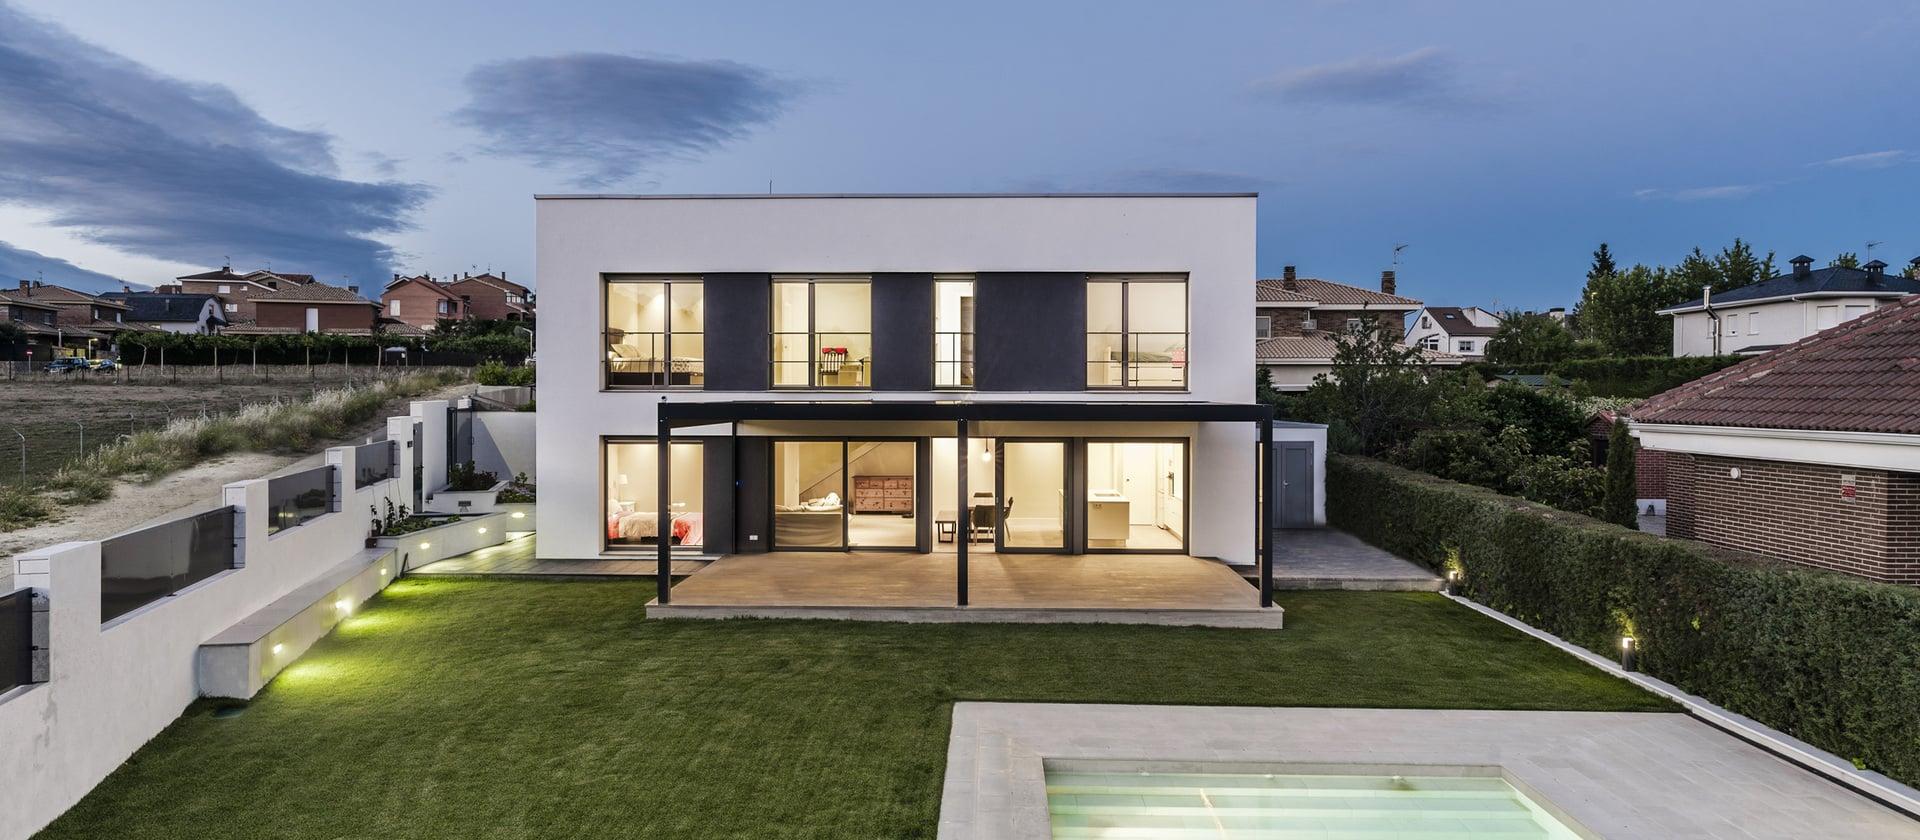 Passiefhuis bij Madrid